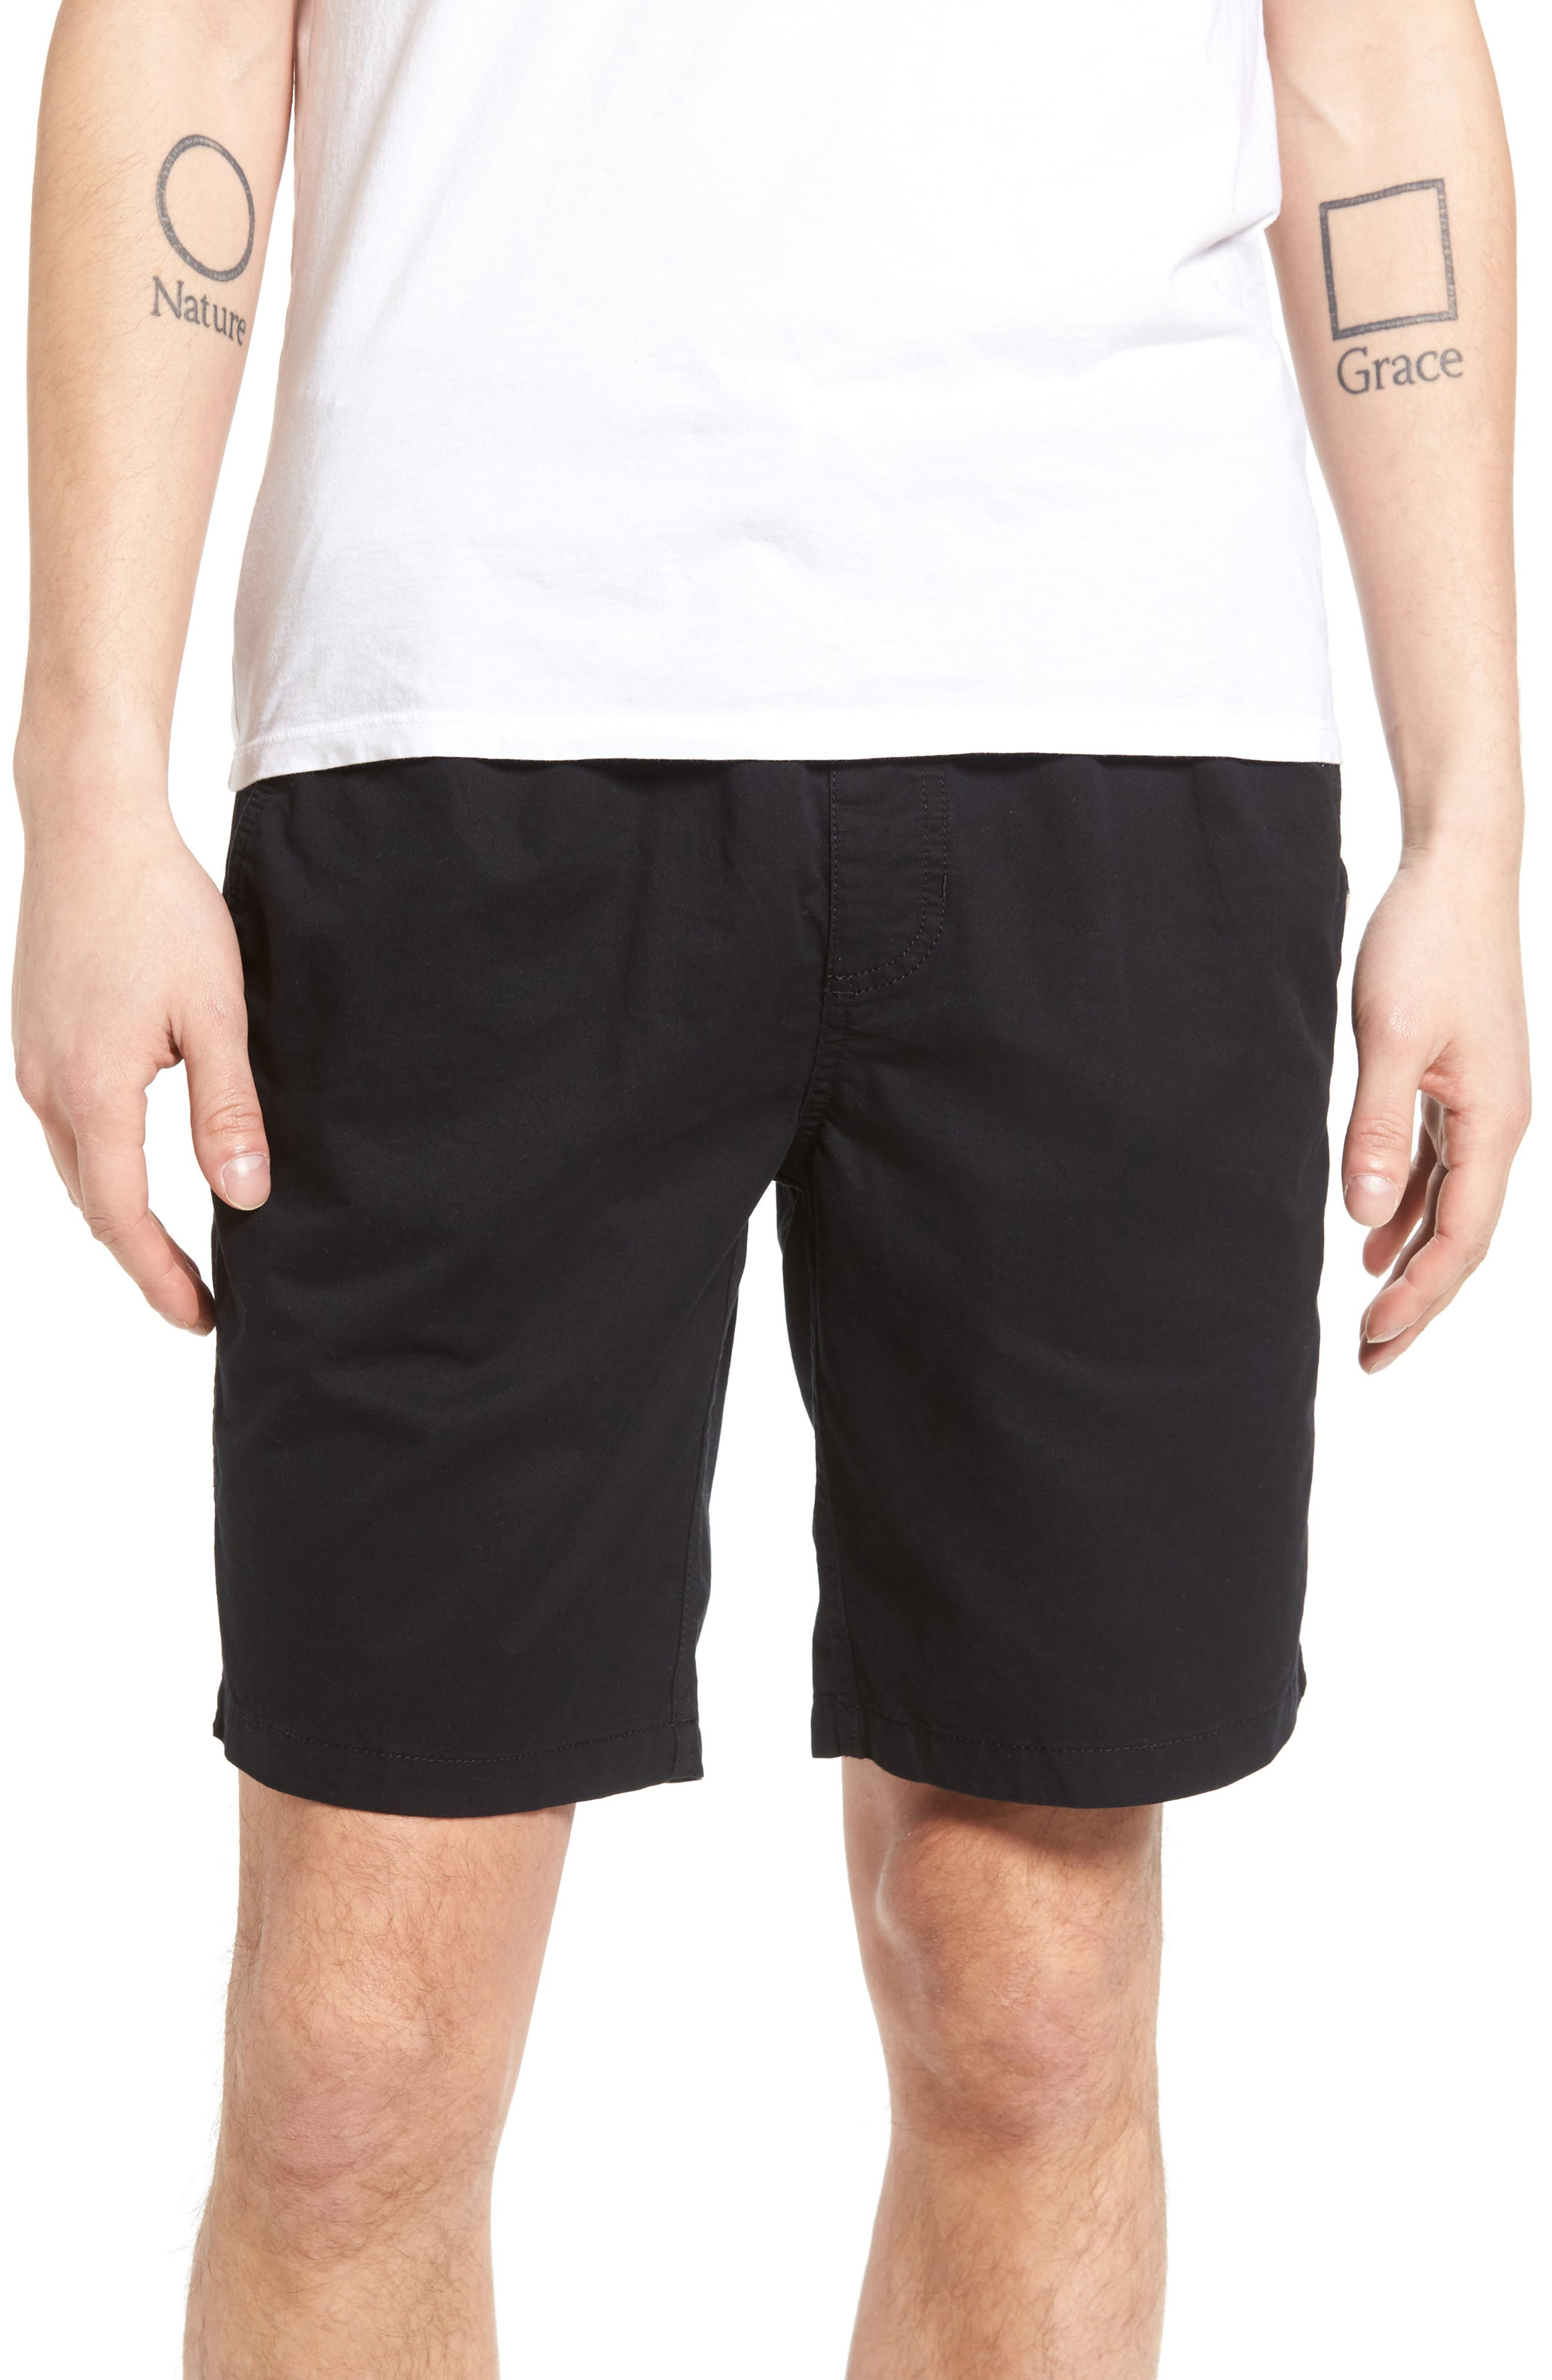 Range Shorts,                         Main,                         color, Black